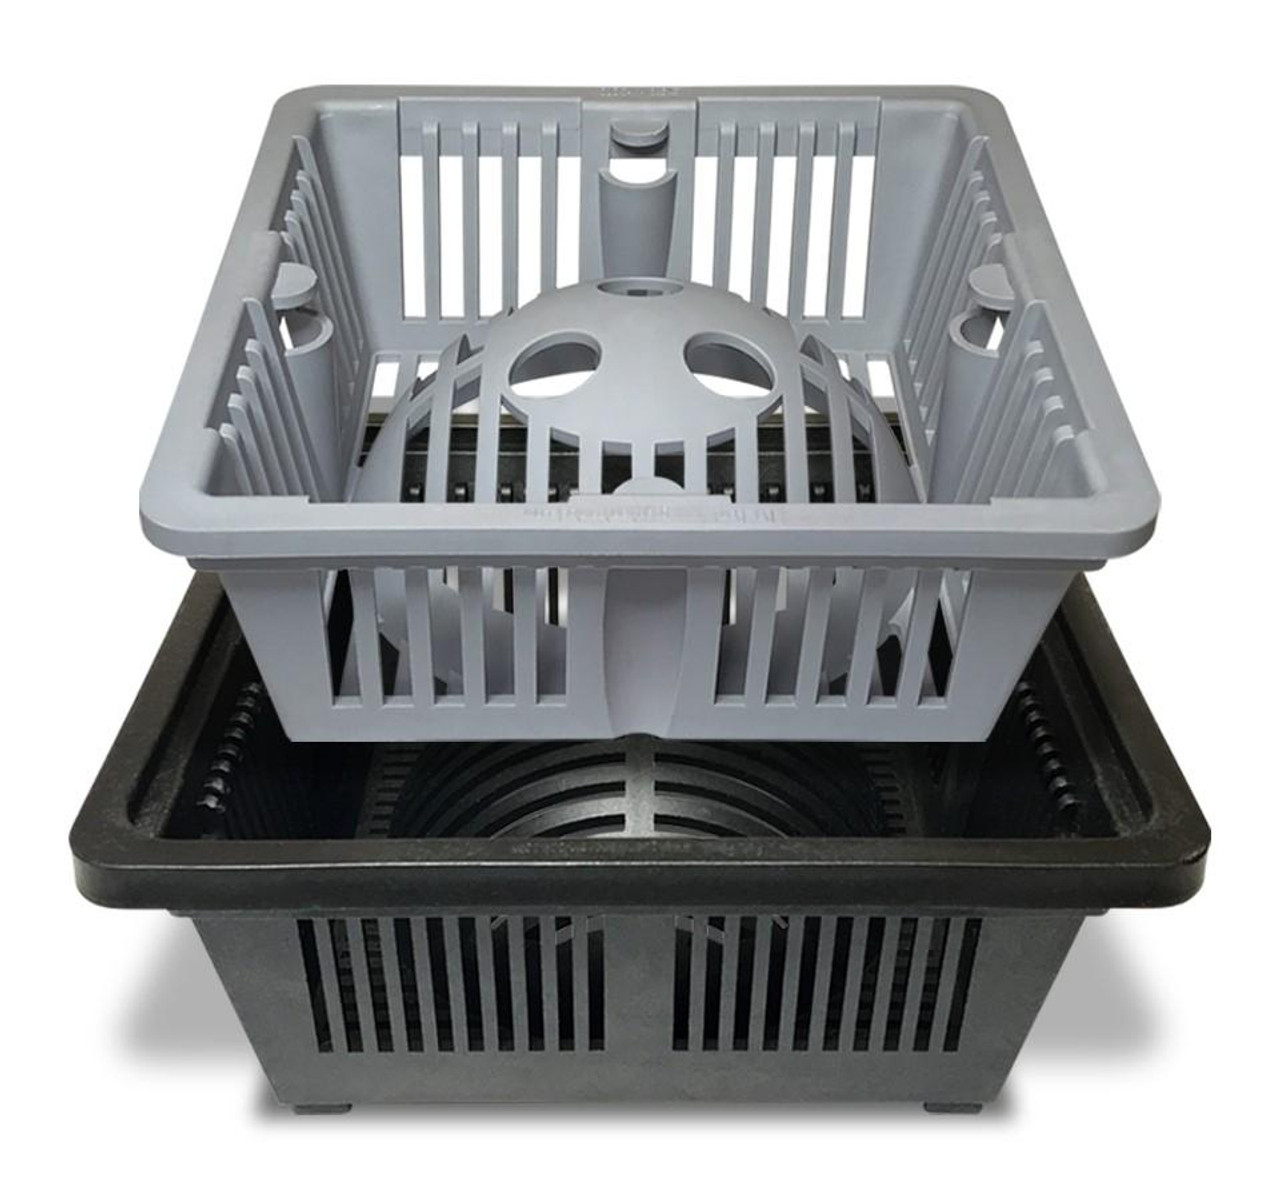 DUO 2-in-1 Floor Sink Basket - 8.5 inch Square, Guardian